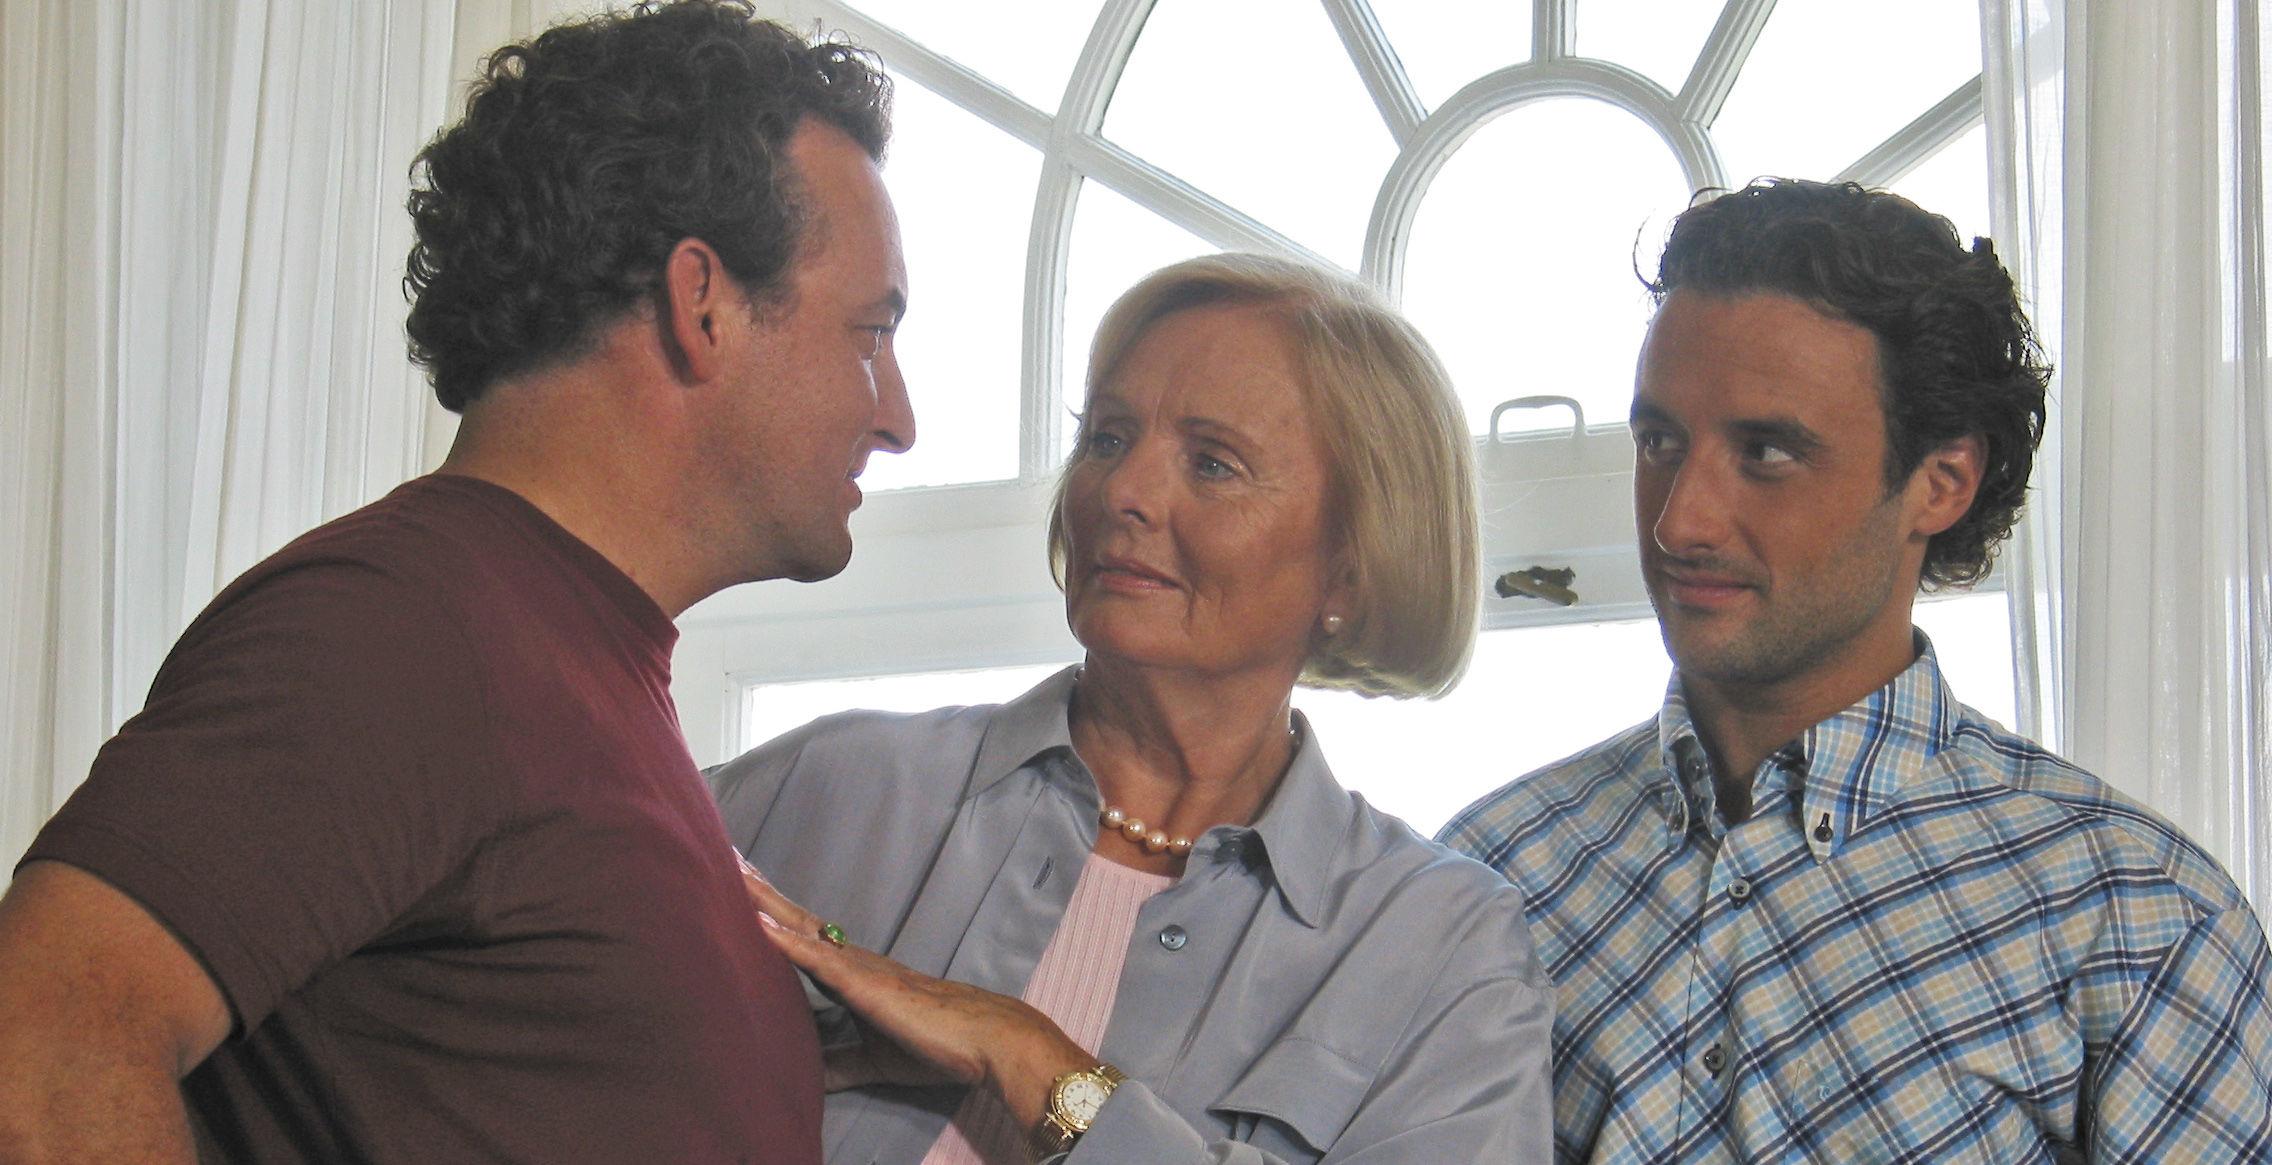 Freddy (Marco Rima), Jaqueline (Ruth Maria Kubitschek), Georg (Gunther Gillian)